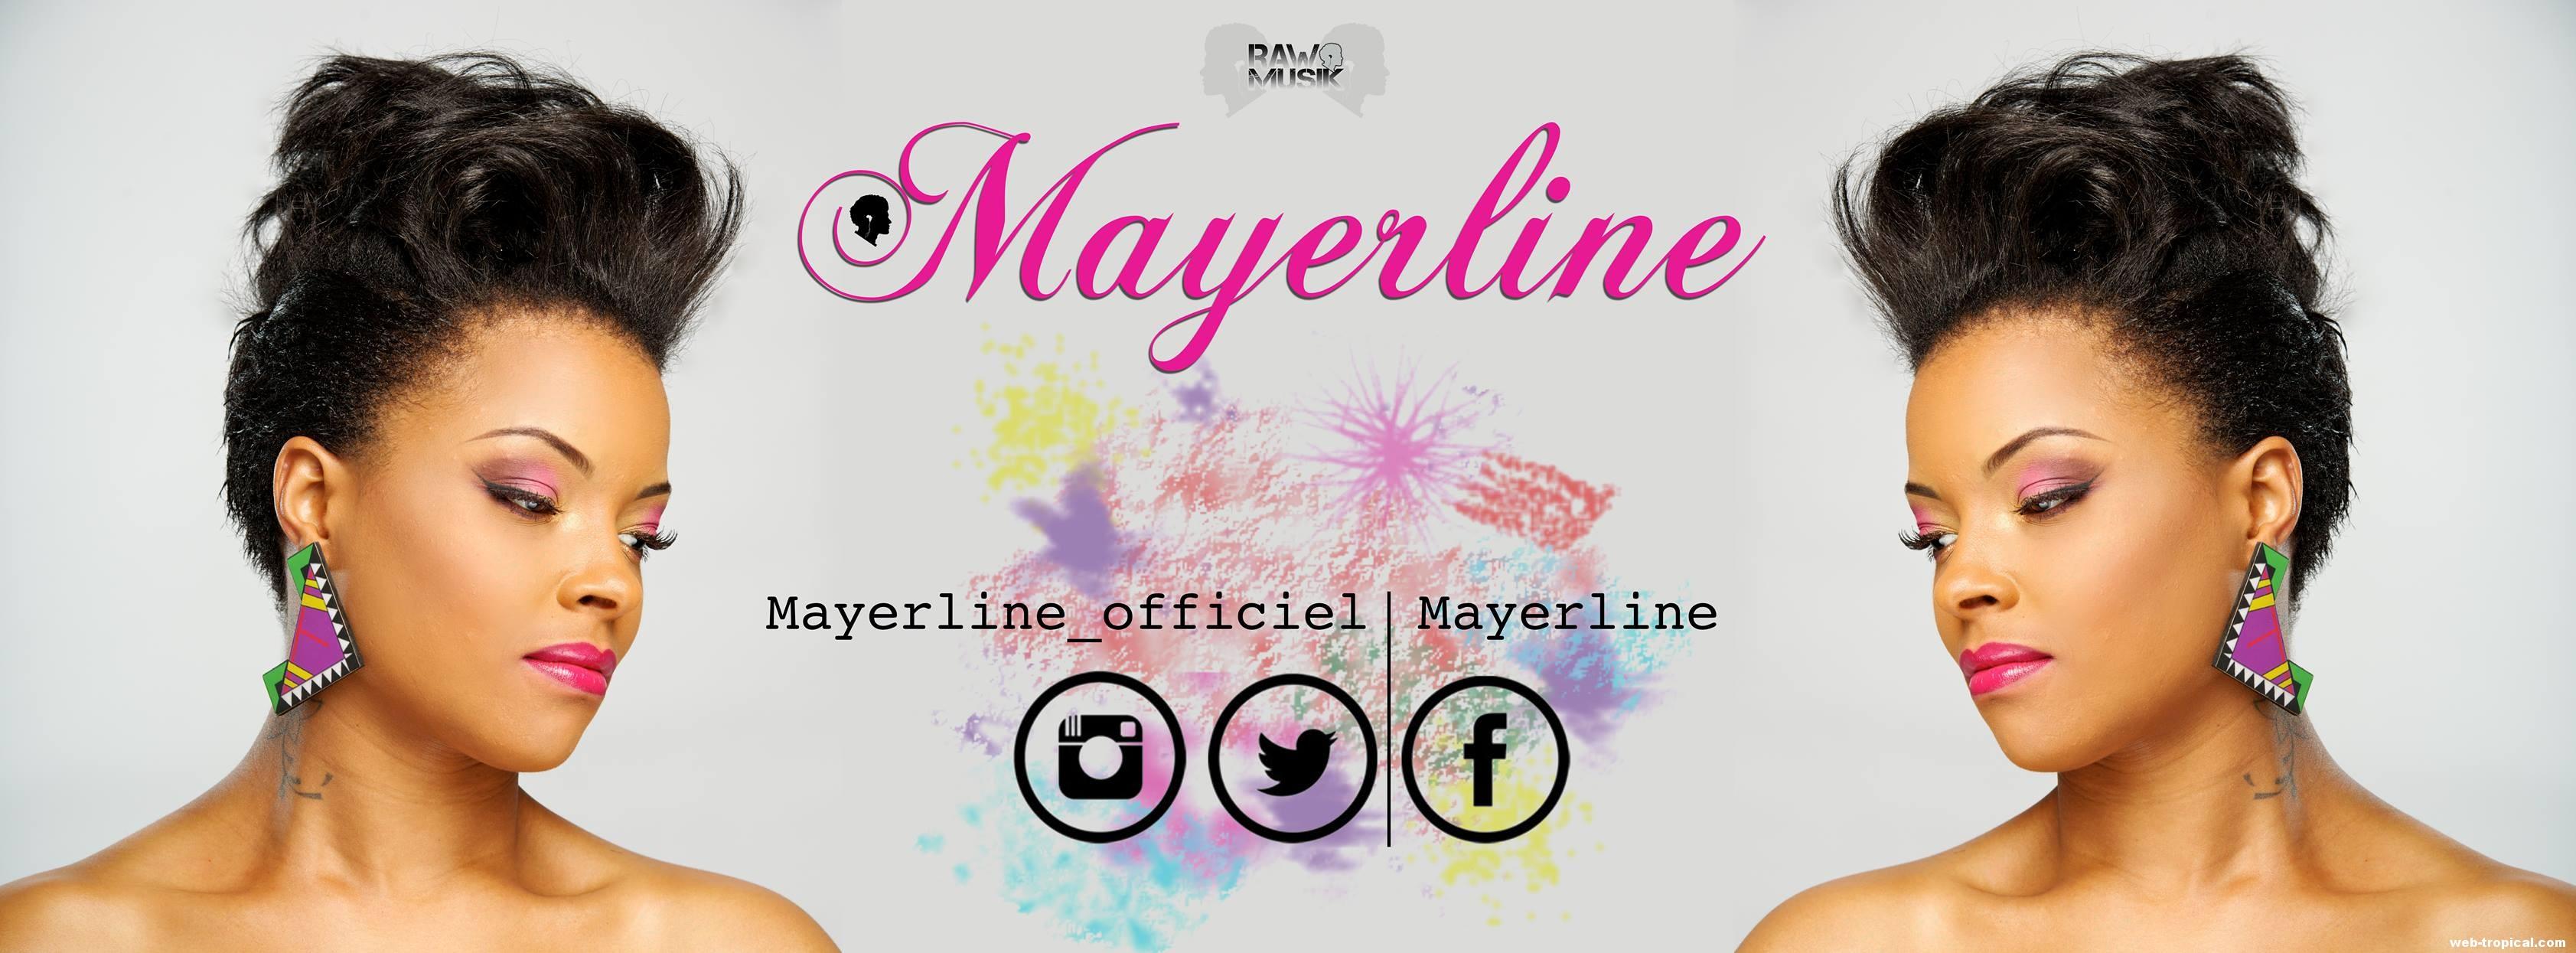 contact_mayerline